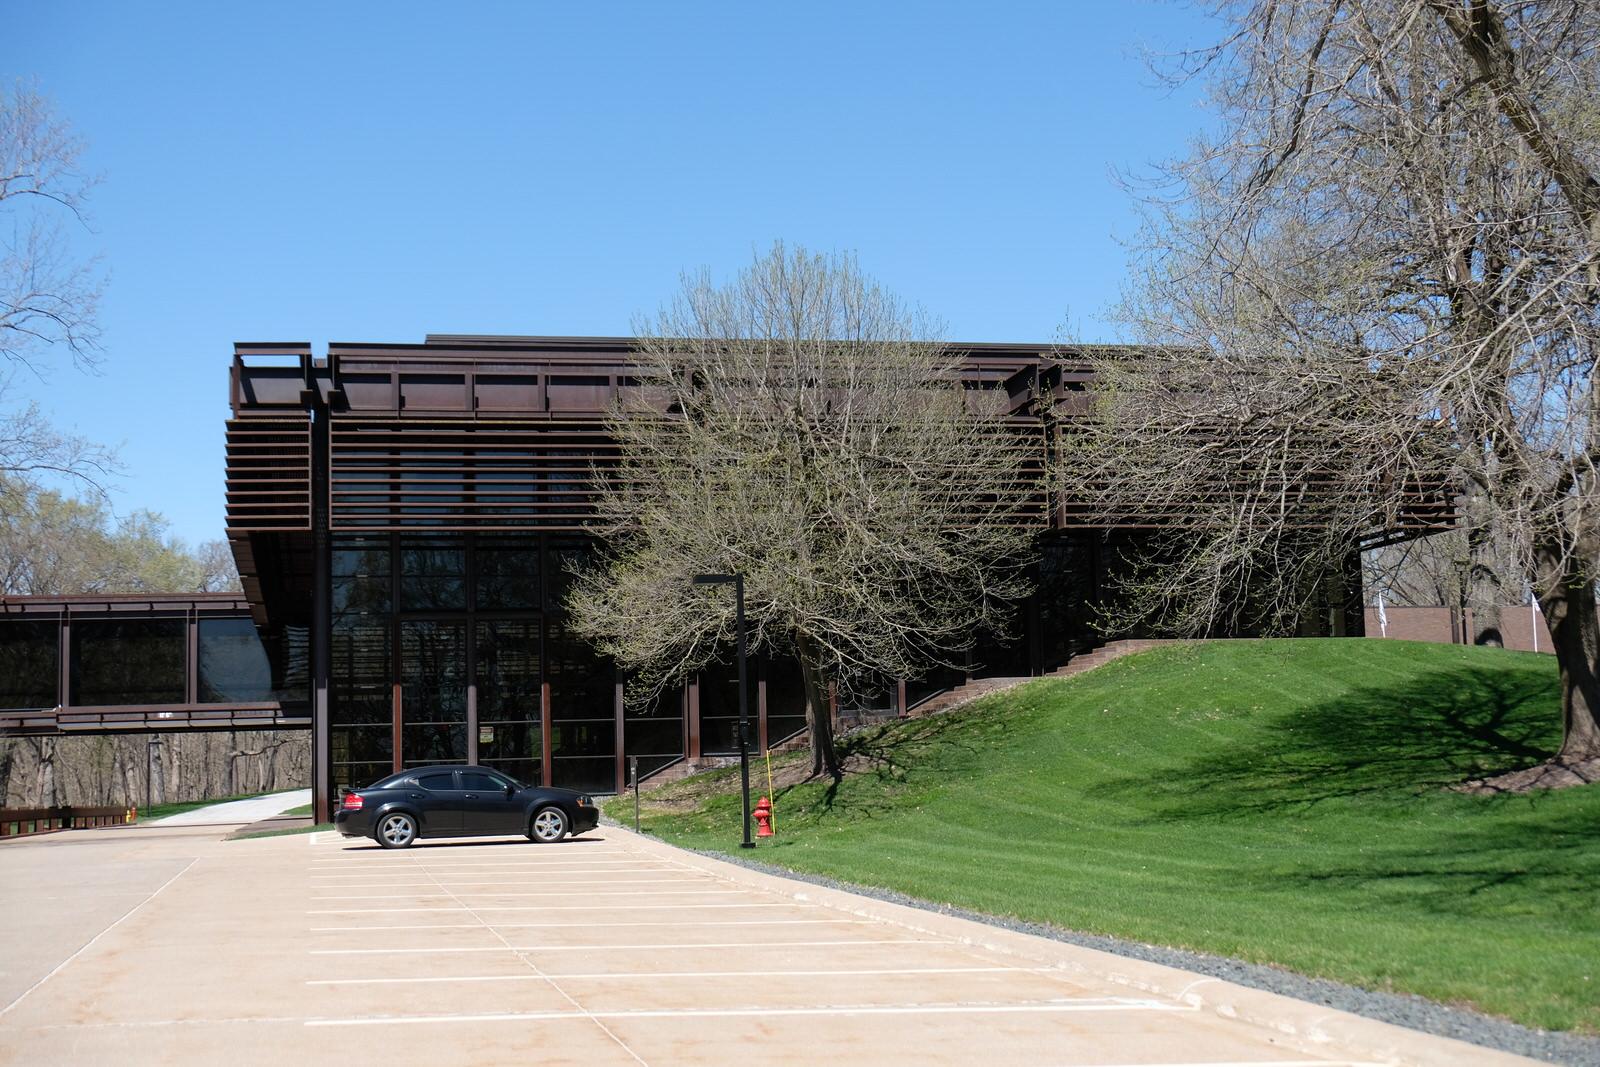 Deere's corporate headquarters in Moline, Illinois.